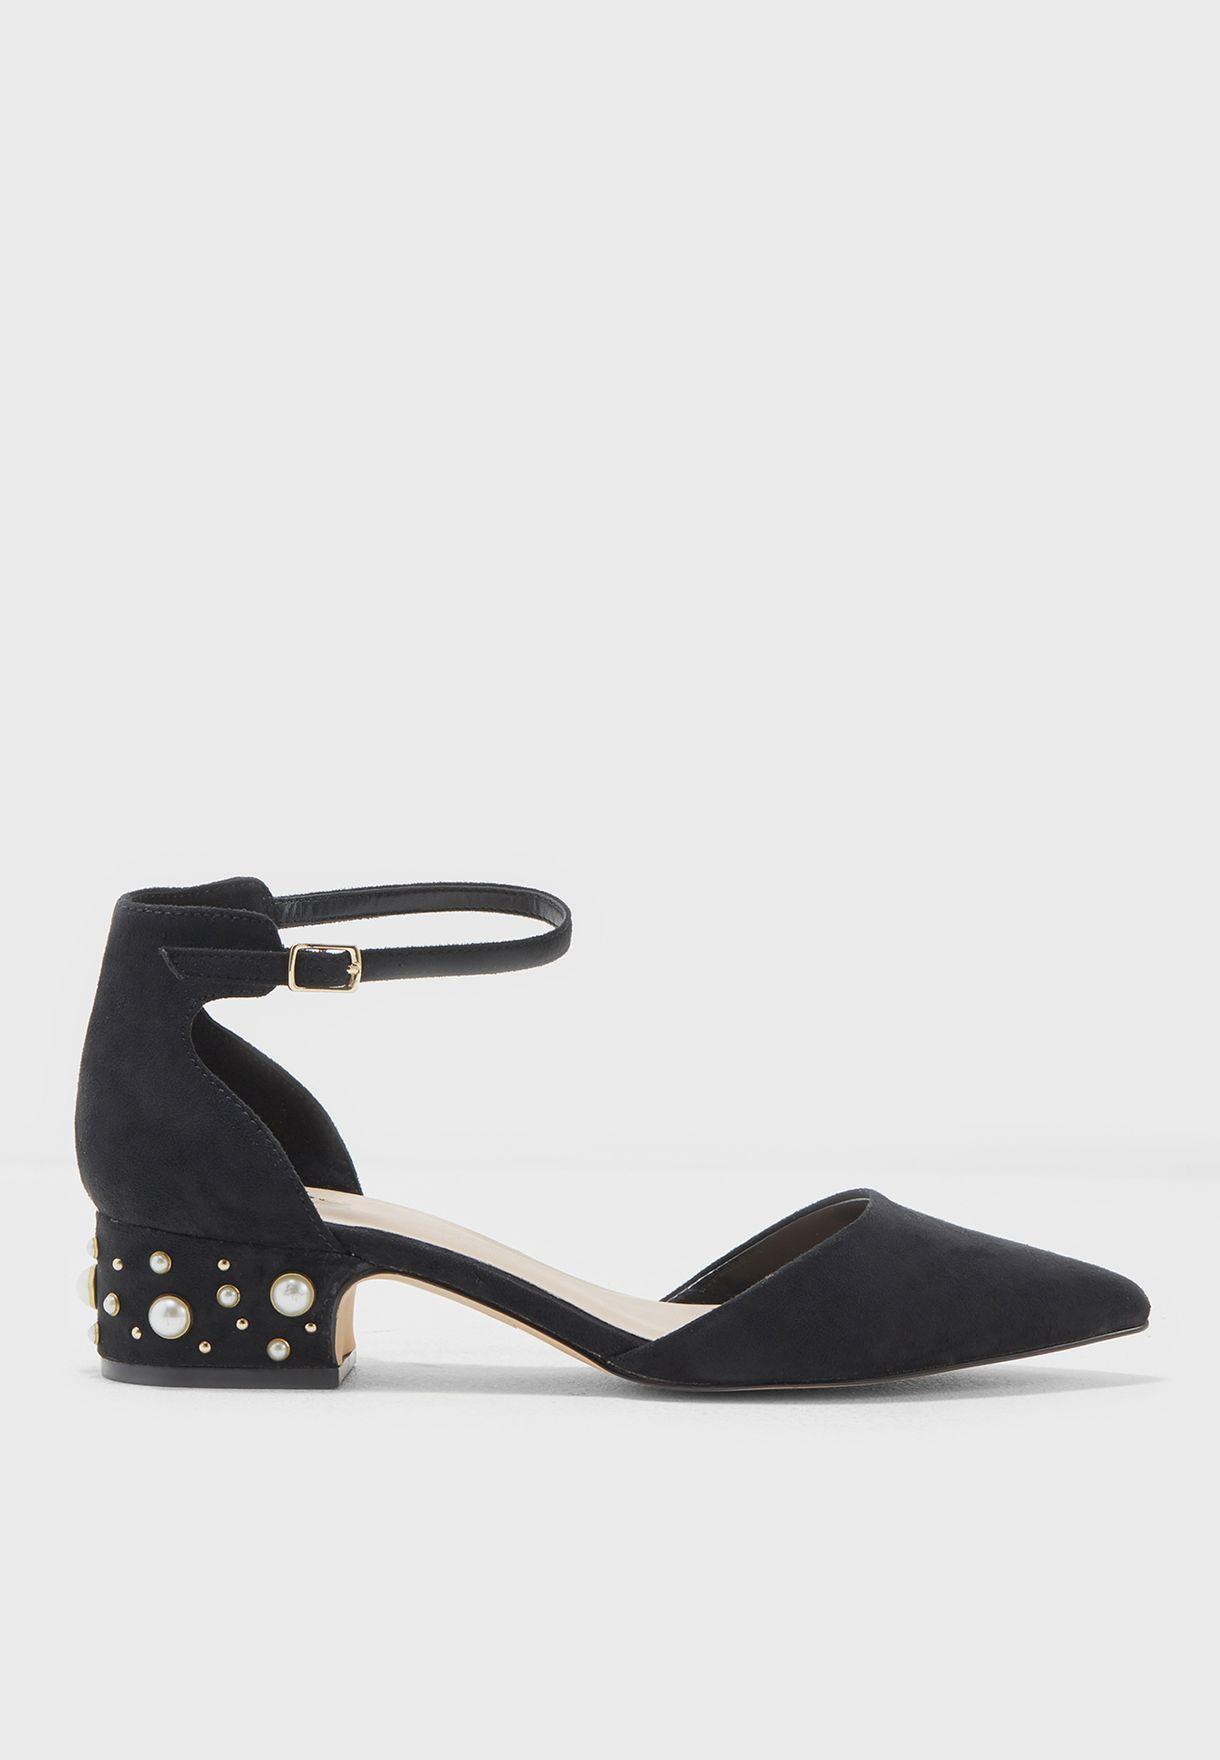 01107803ab00c3 Shop Aldo black Pointy Toe Pumps With Embellished Heel WILIWIEL98 ...